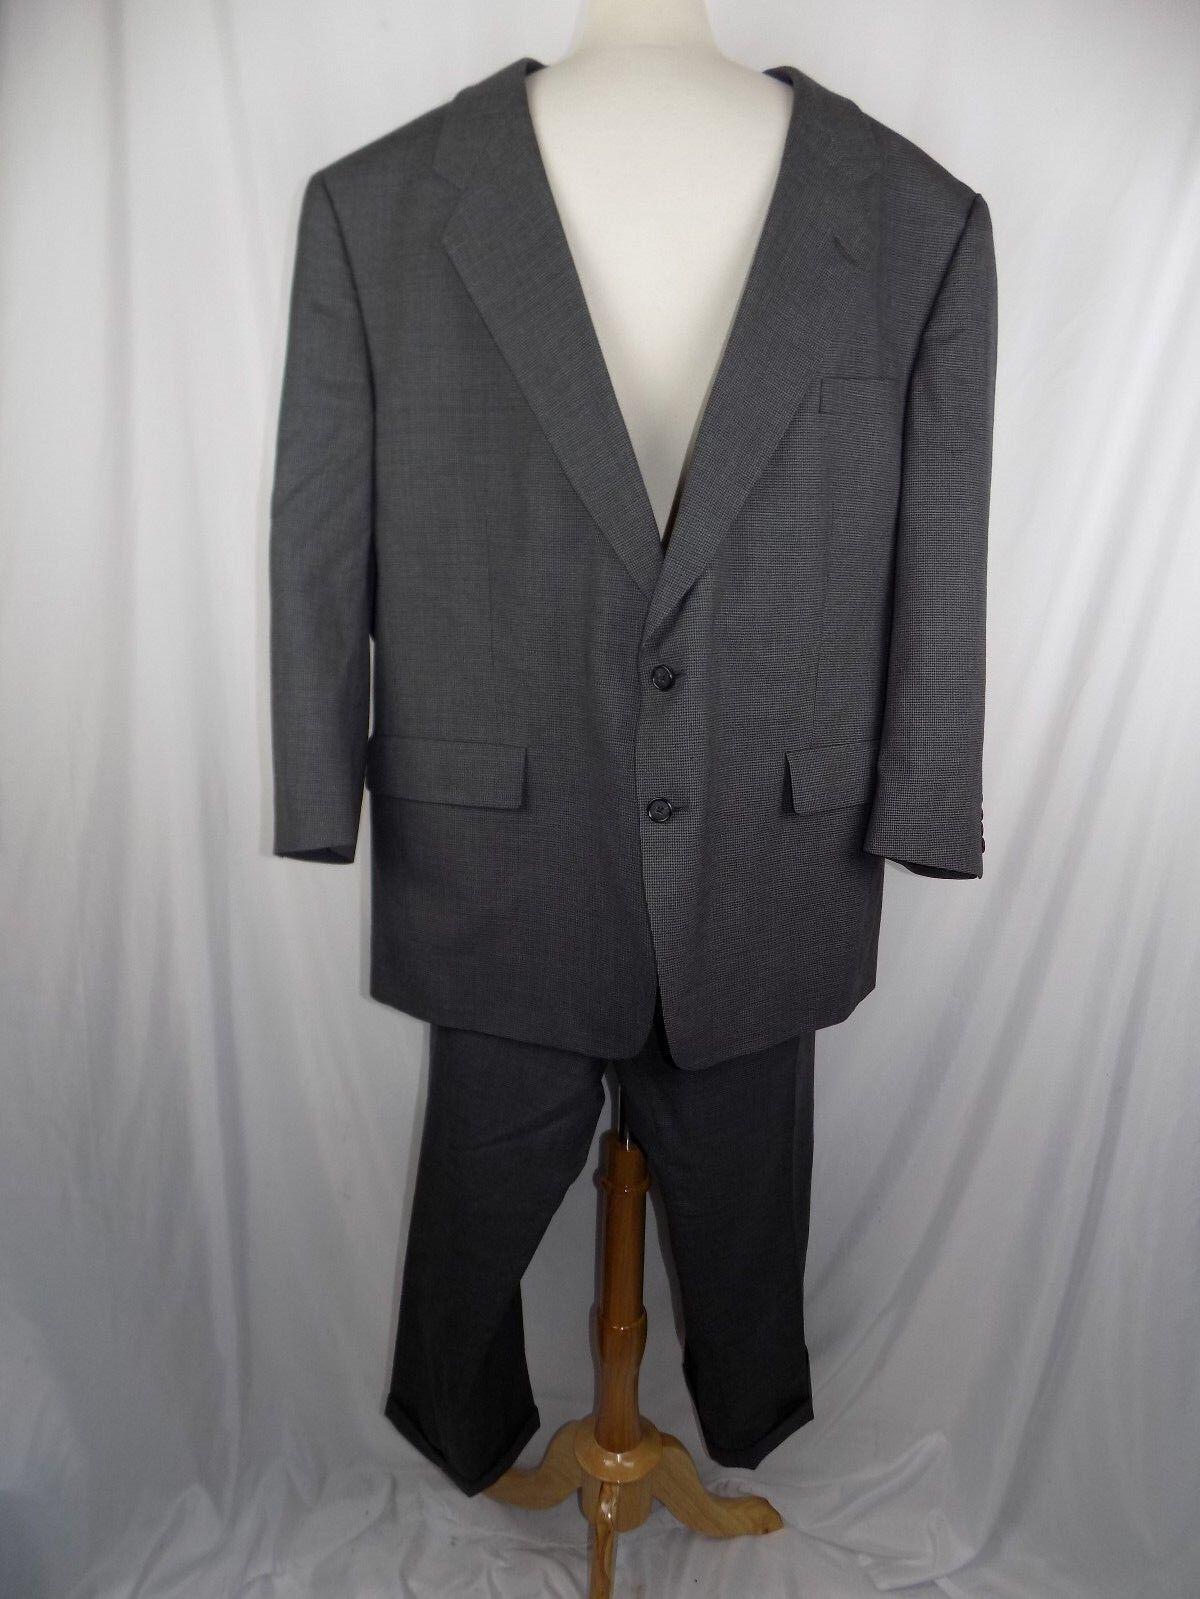 Hart Schaffner Marx 53 R Suit grau Pinstripe Wool USA 2 Button  Herren 46 x 28